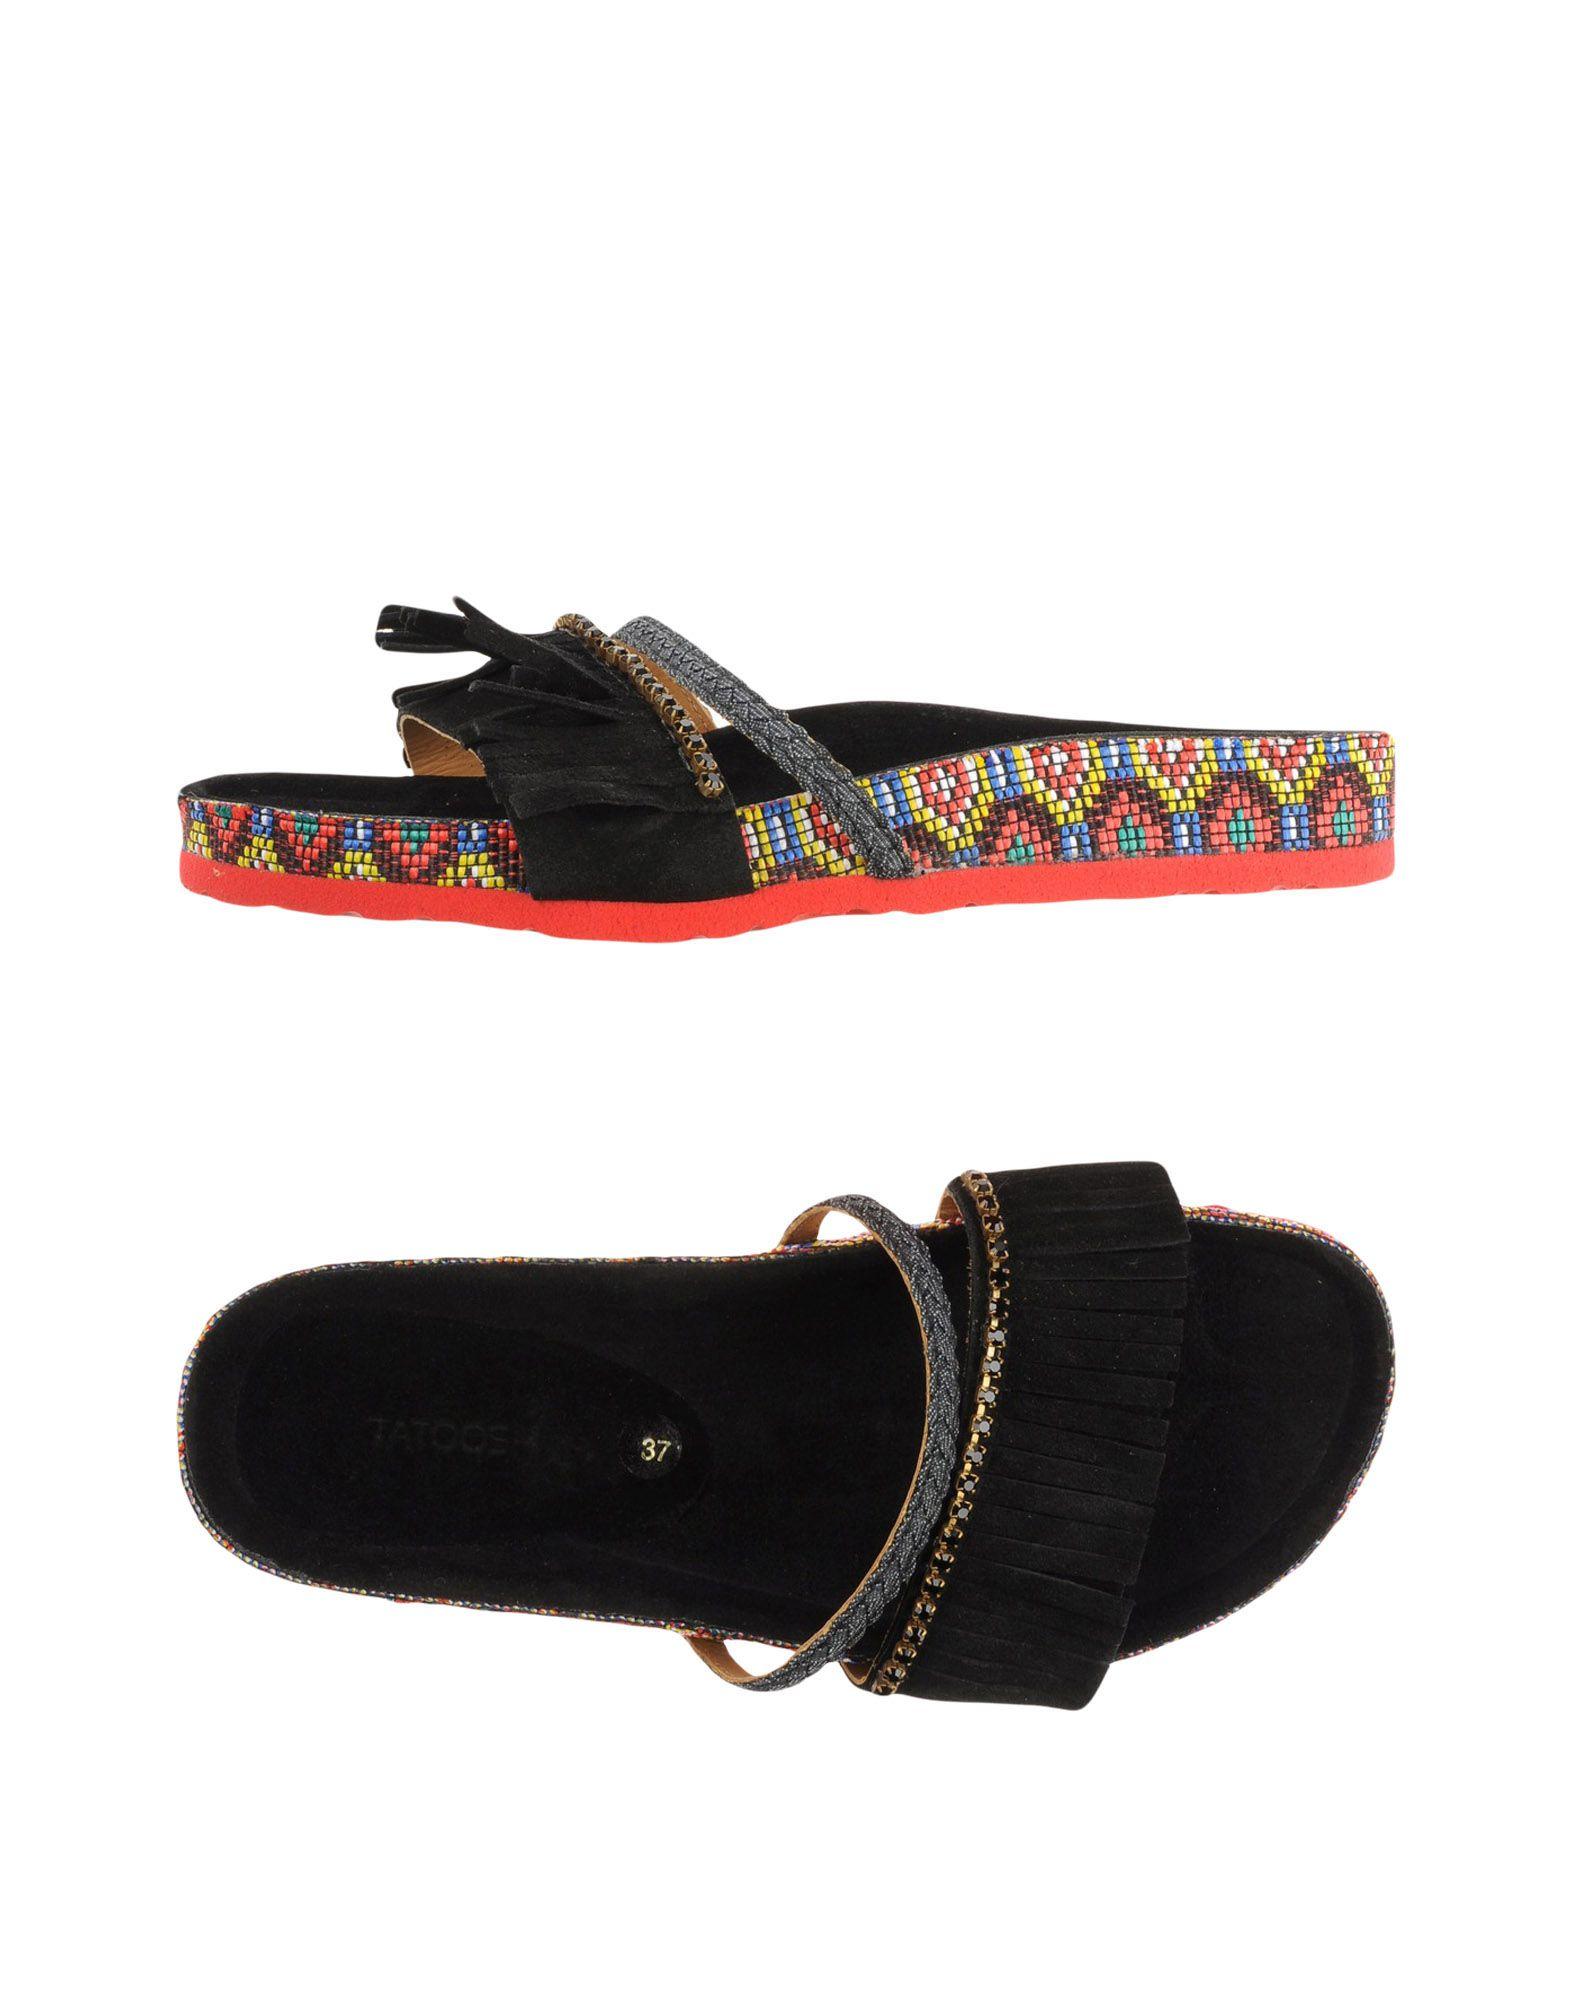 TATOOSH Sandals in Black